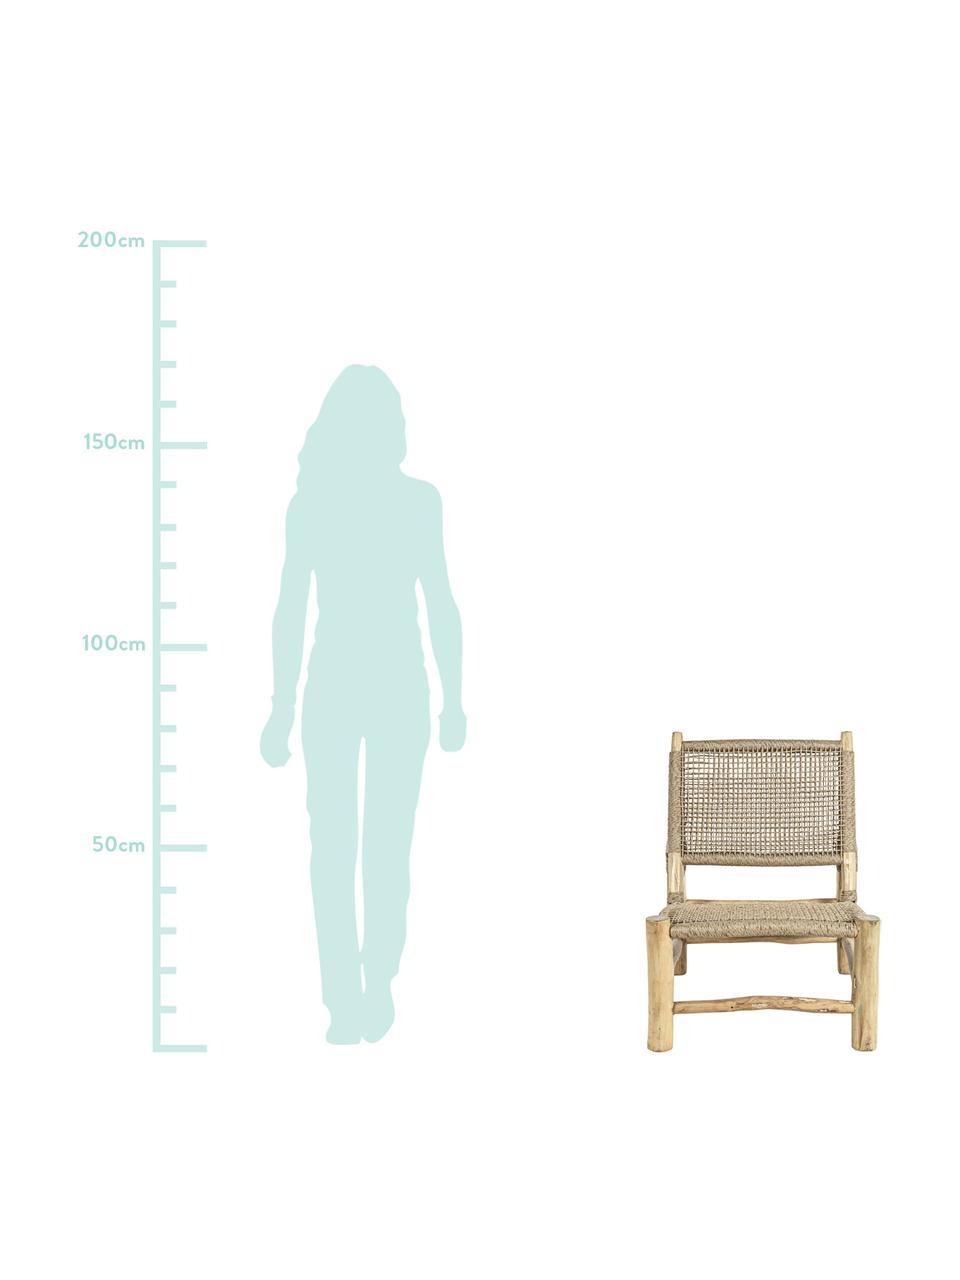 Teakhouten loungefauteuil Lampok, Frame: teakhout, Beige, 62 x 79 cm